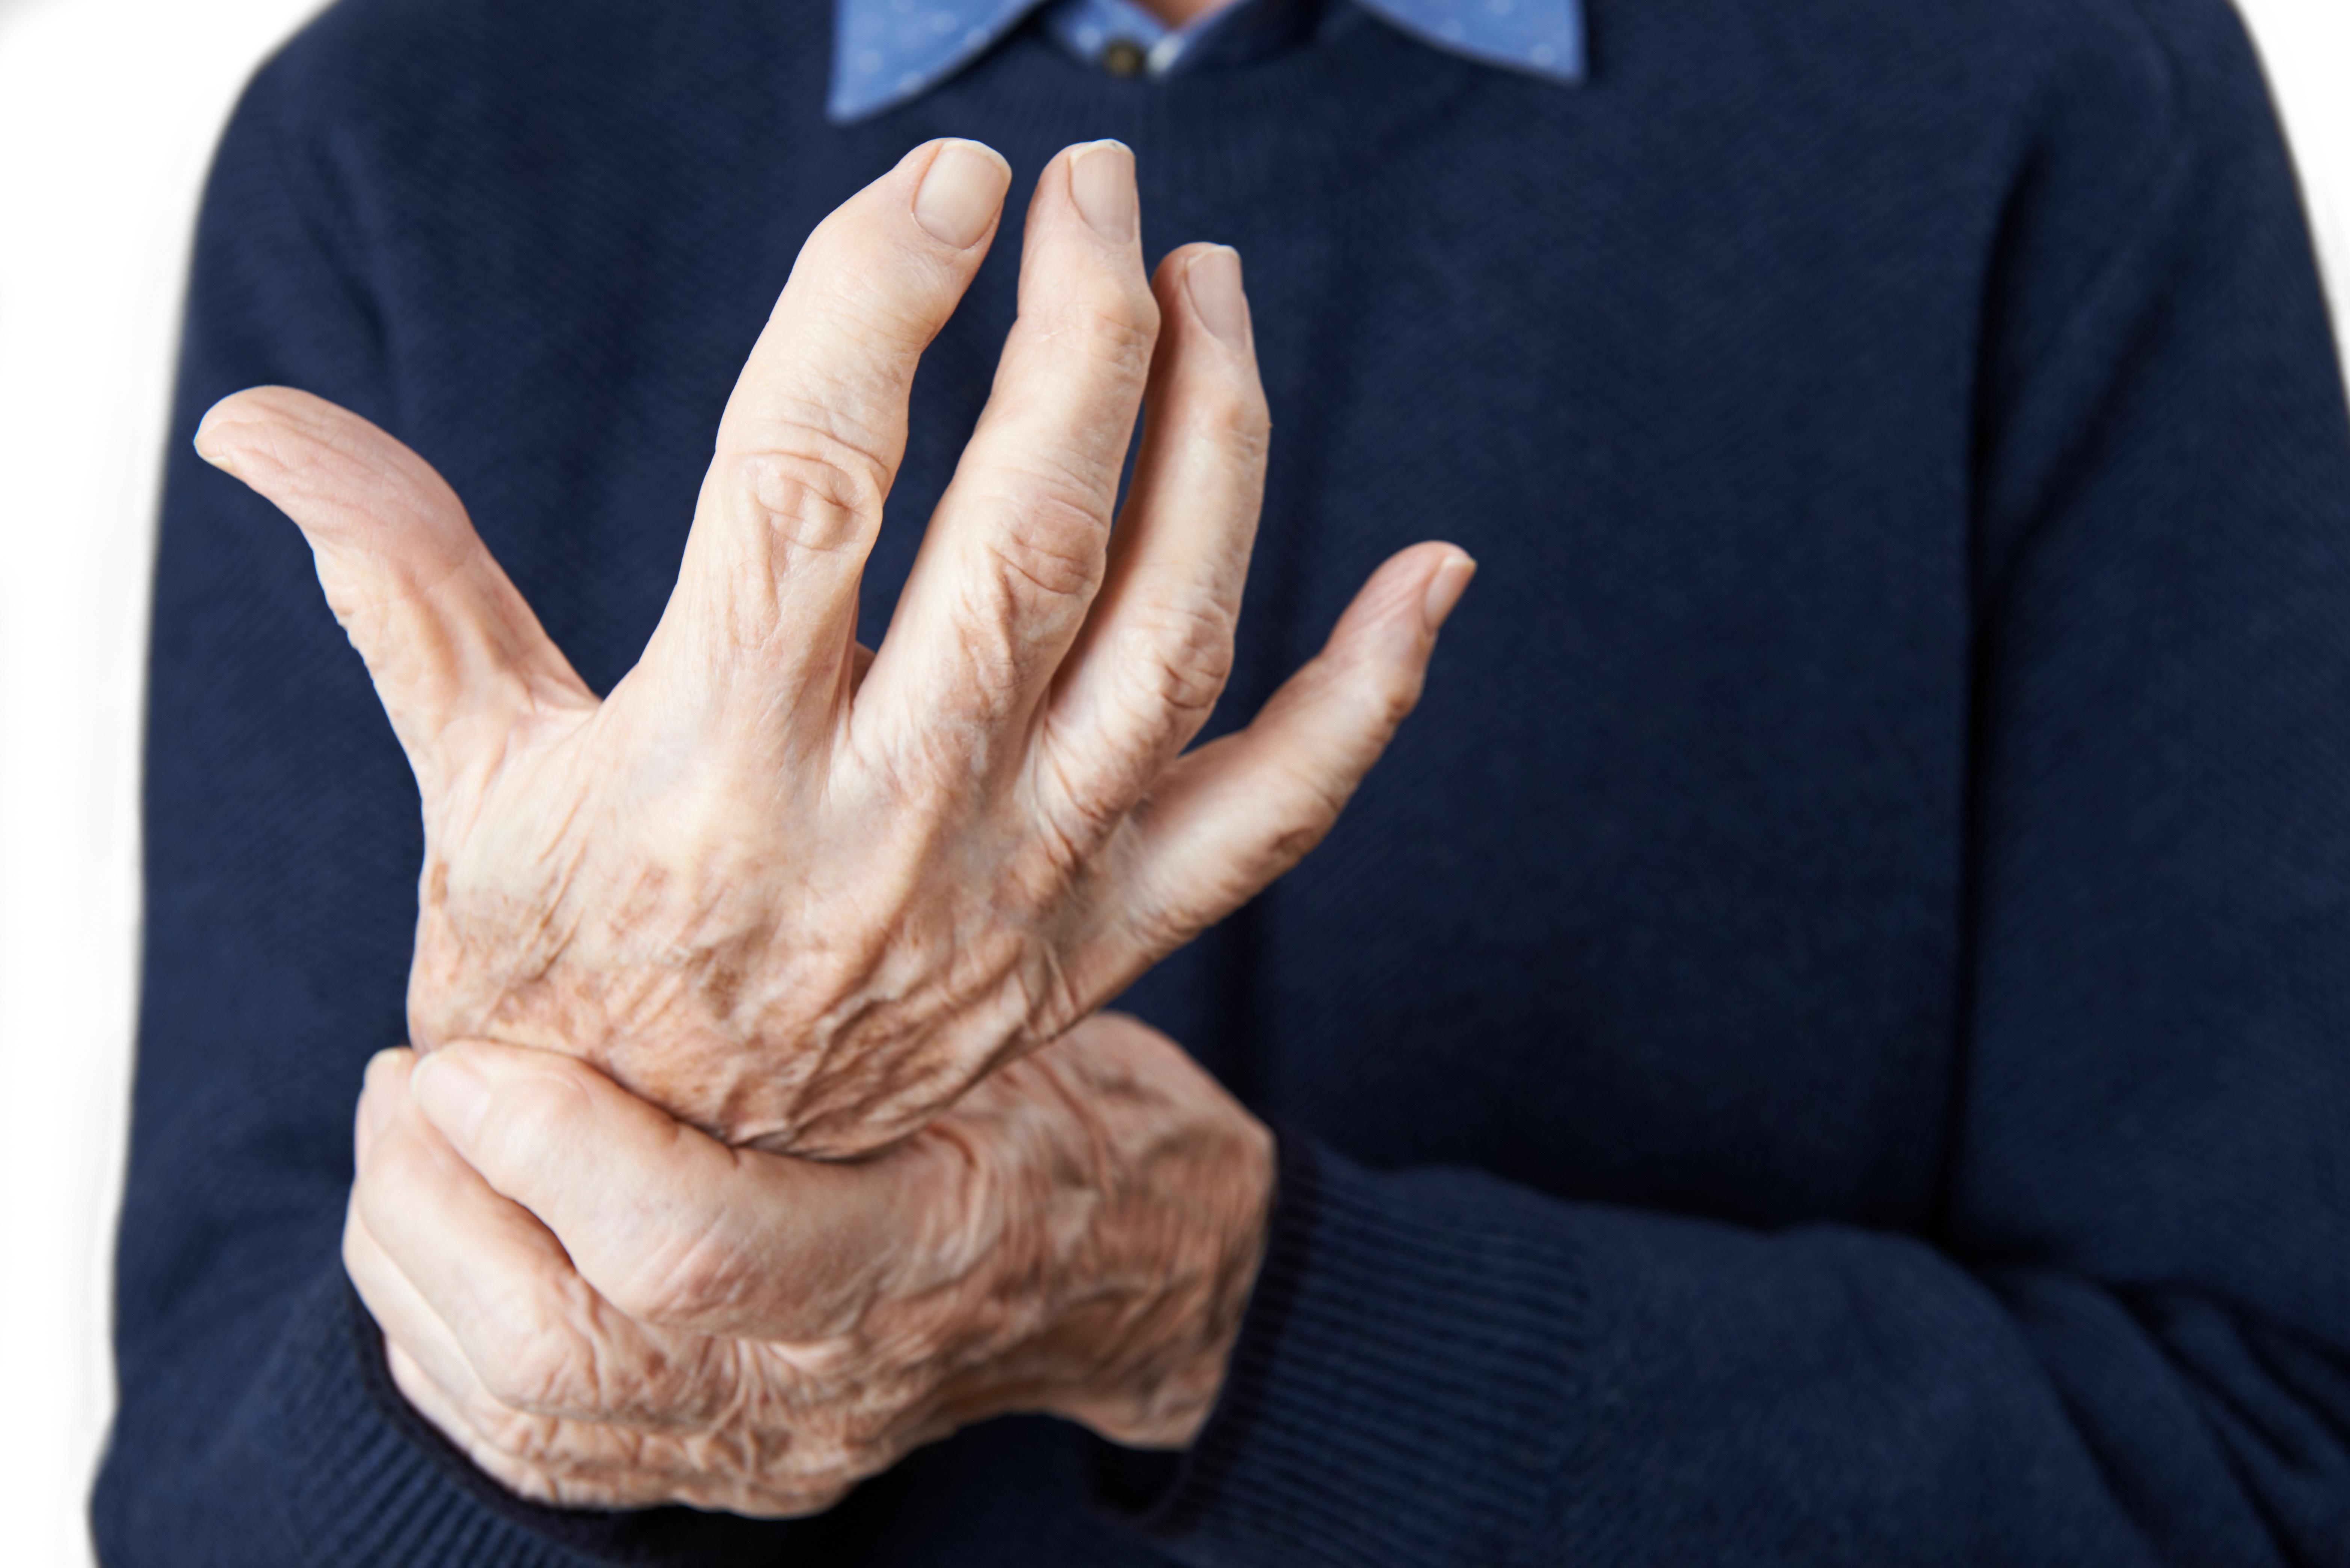 The Most Common Arthritis Risk Factors